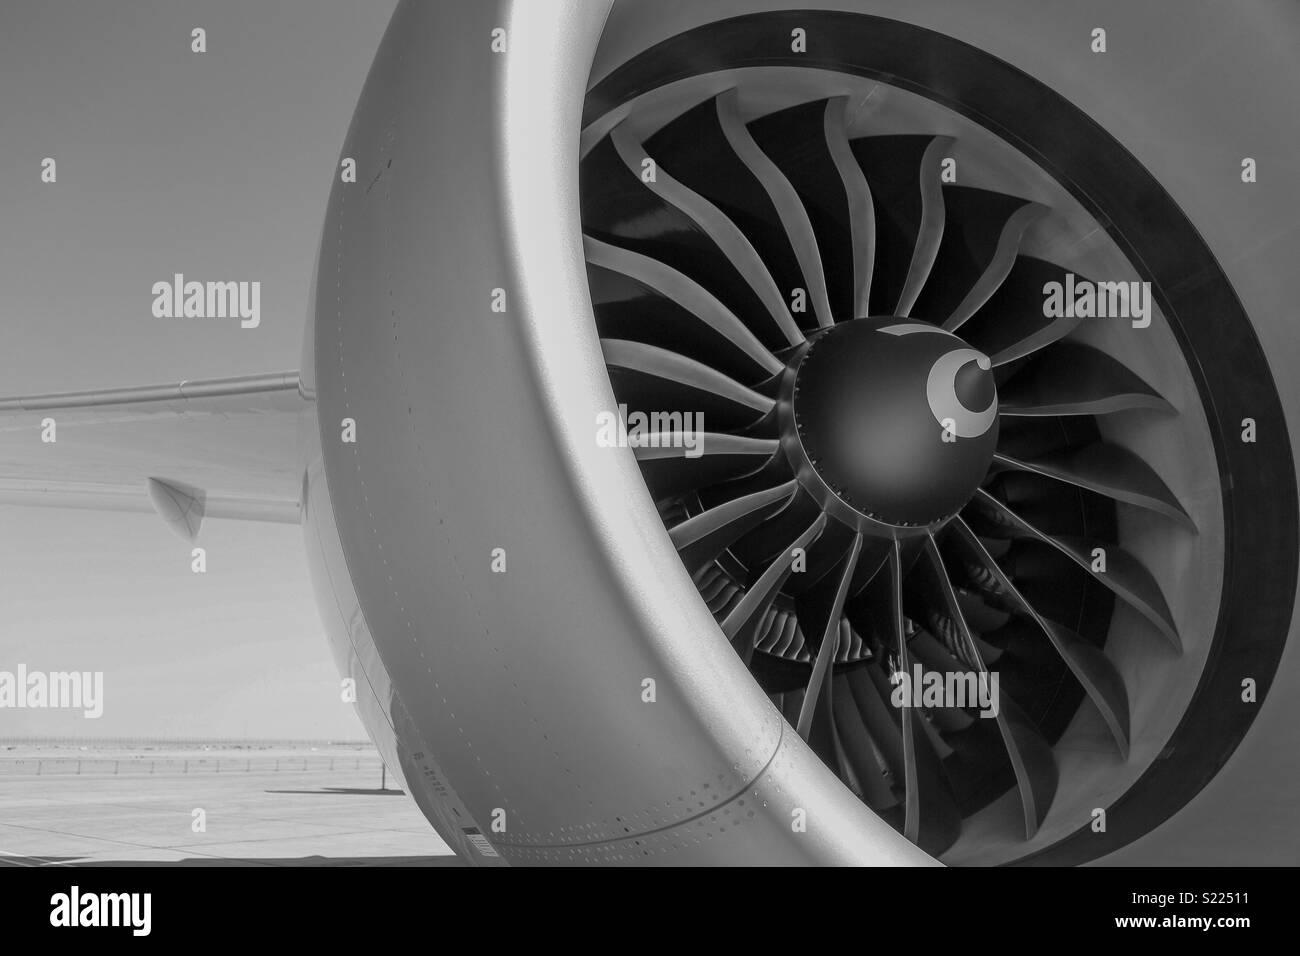 Airbus Engine - Stock Image